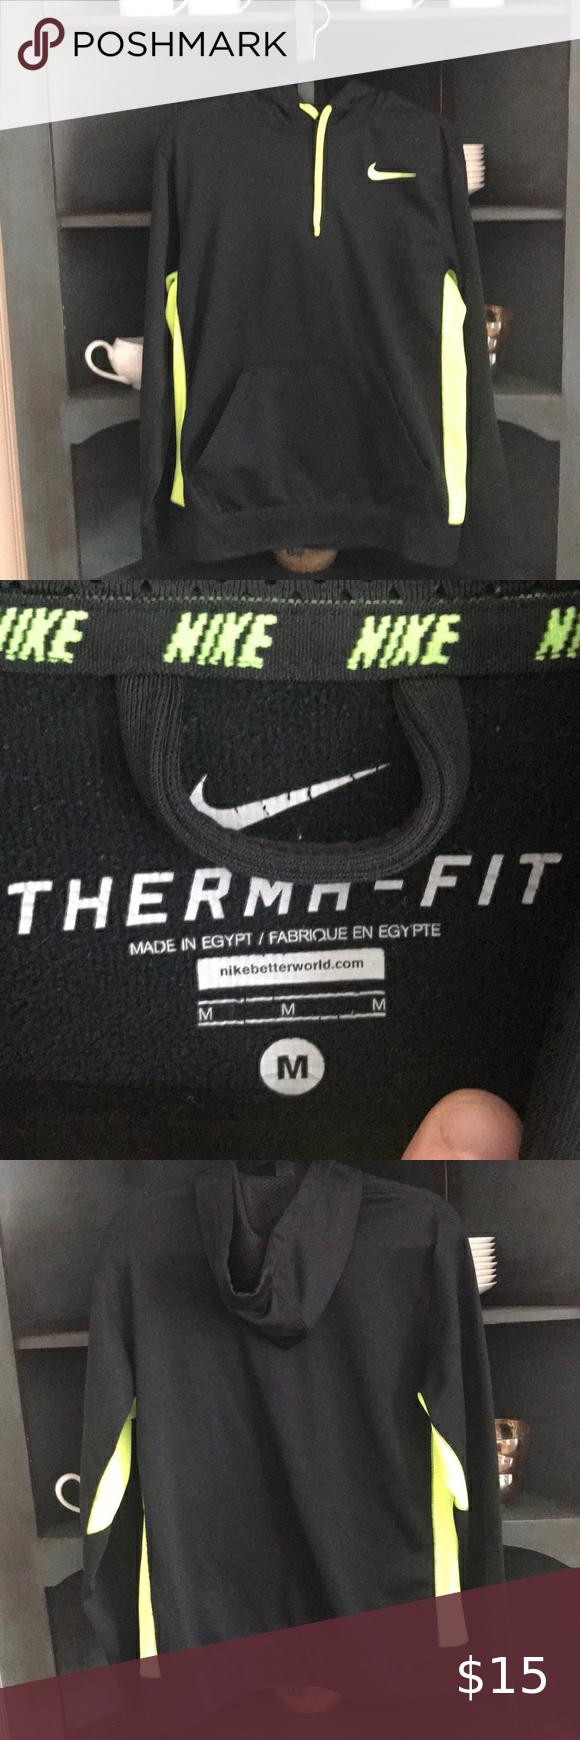 Men S Nike Therma Fit Sweatshirt Like New Men S Nike Sweatshirt In Black And Neon Yellow Nike Shirts Sweatshirt Sweatshirts Workout Sweatshirt Sweatshirt Shirt [ 1740 x 580 Pixel ]